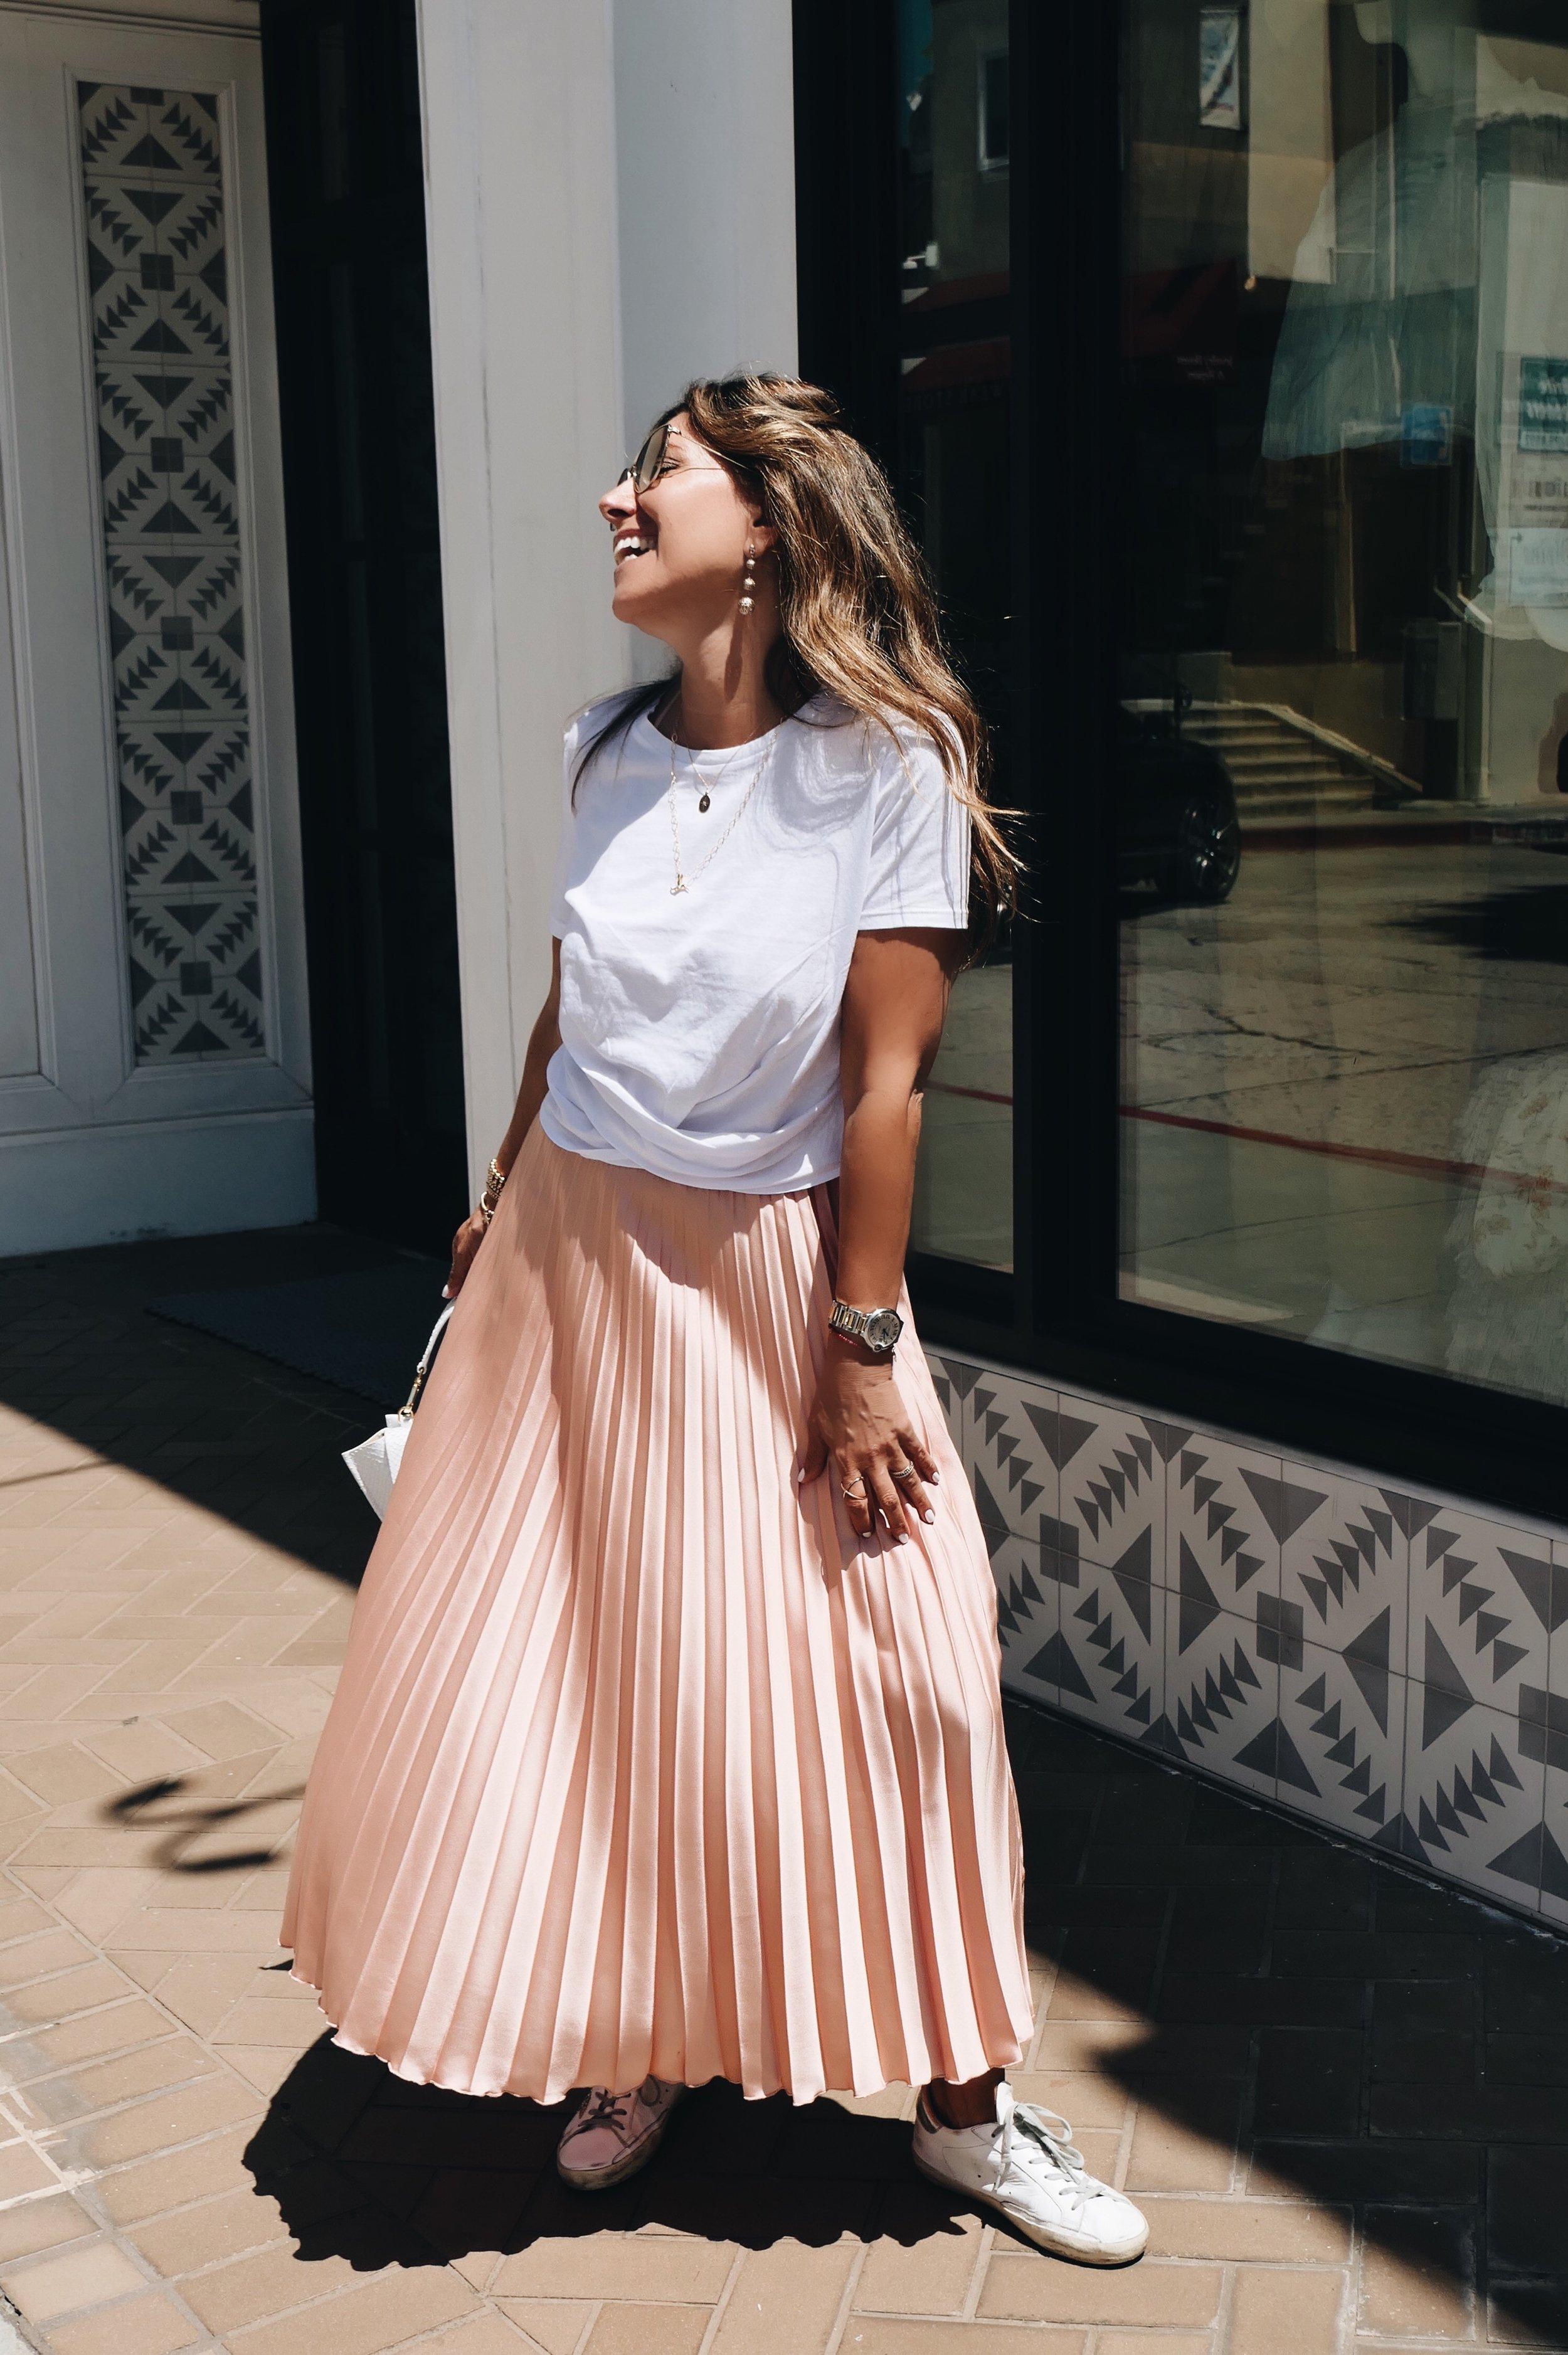 MM_ZARA Pink Skirt and Wrap Tee 001.JPG